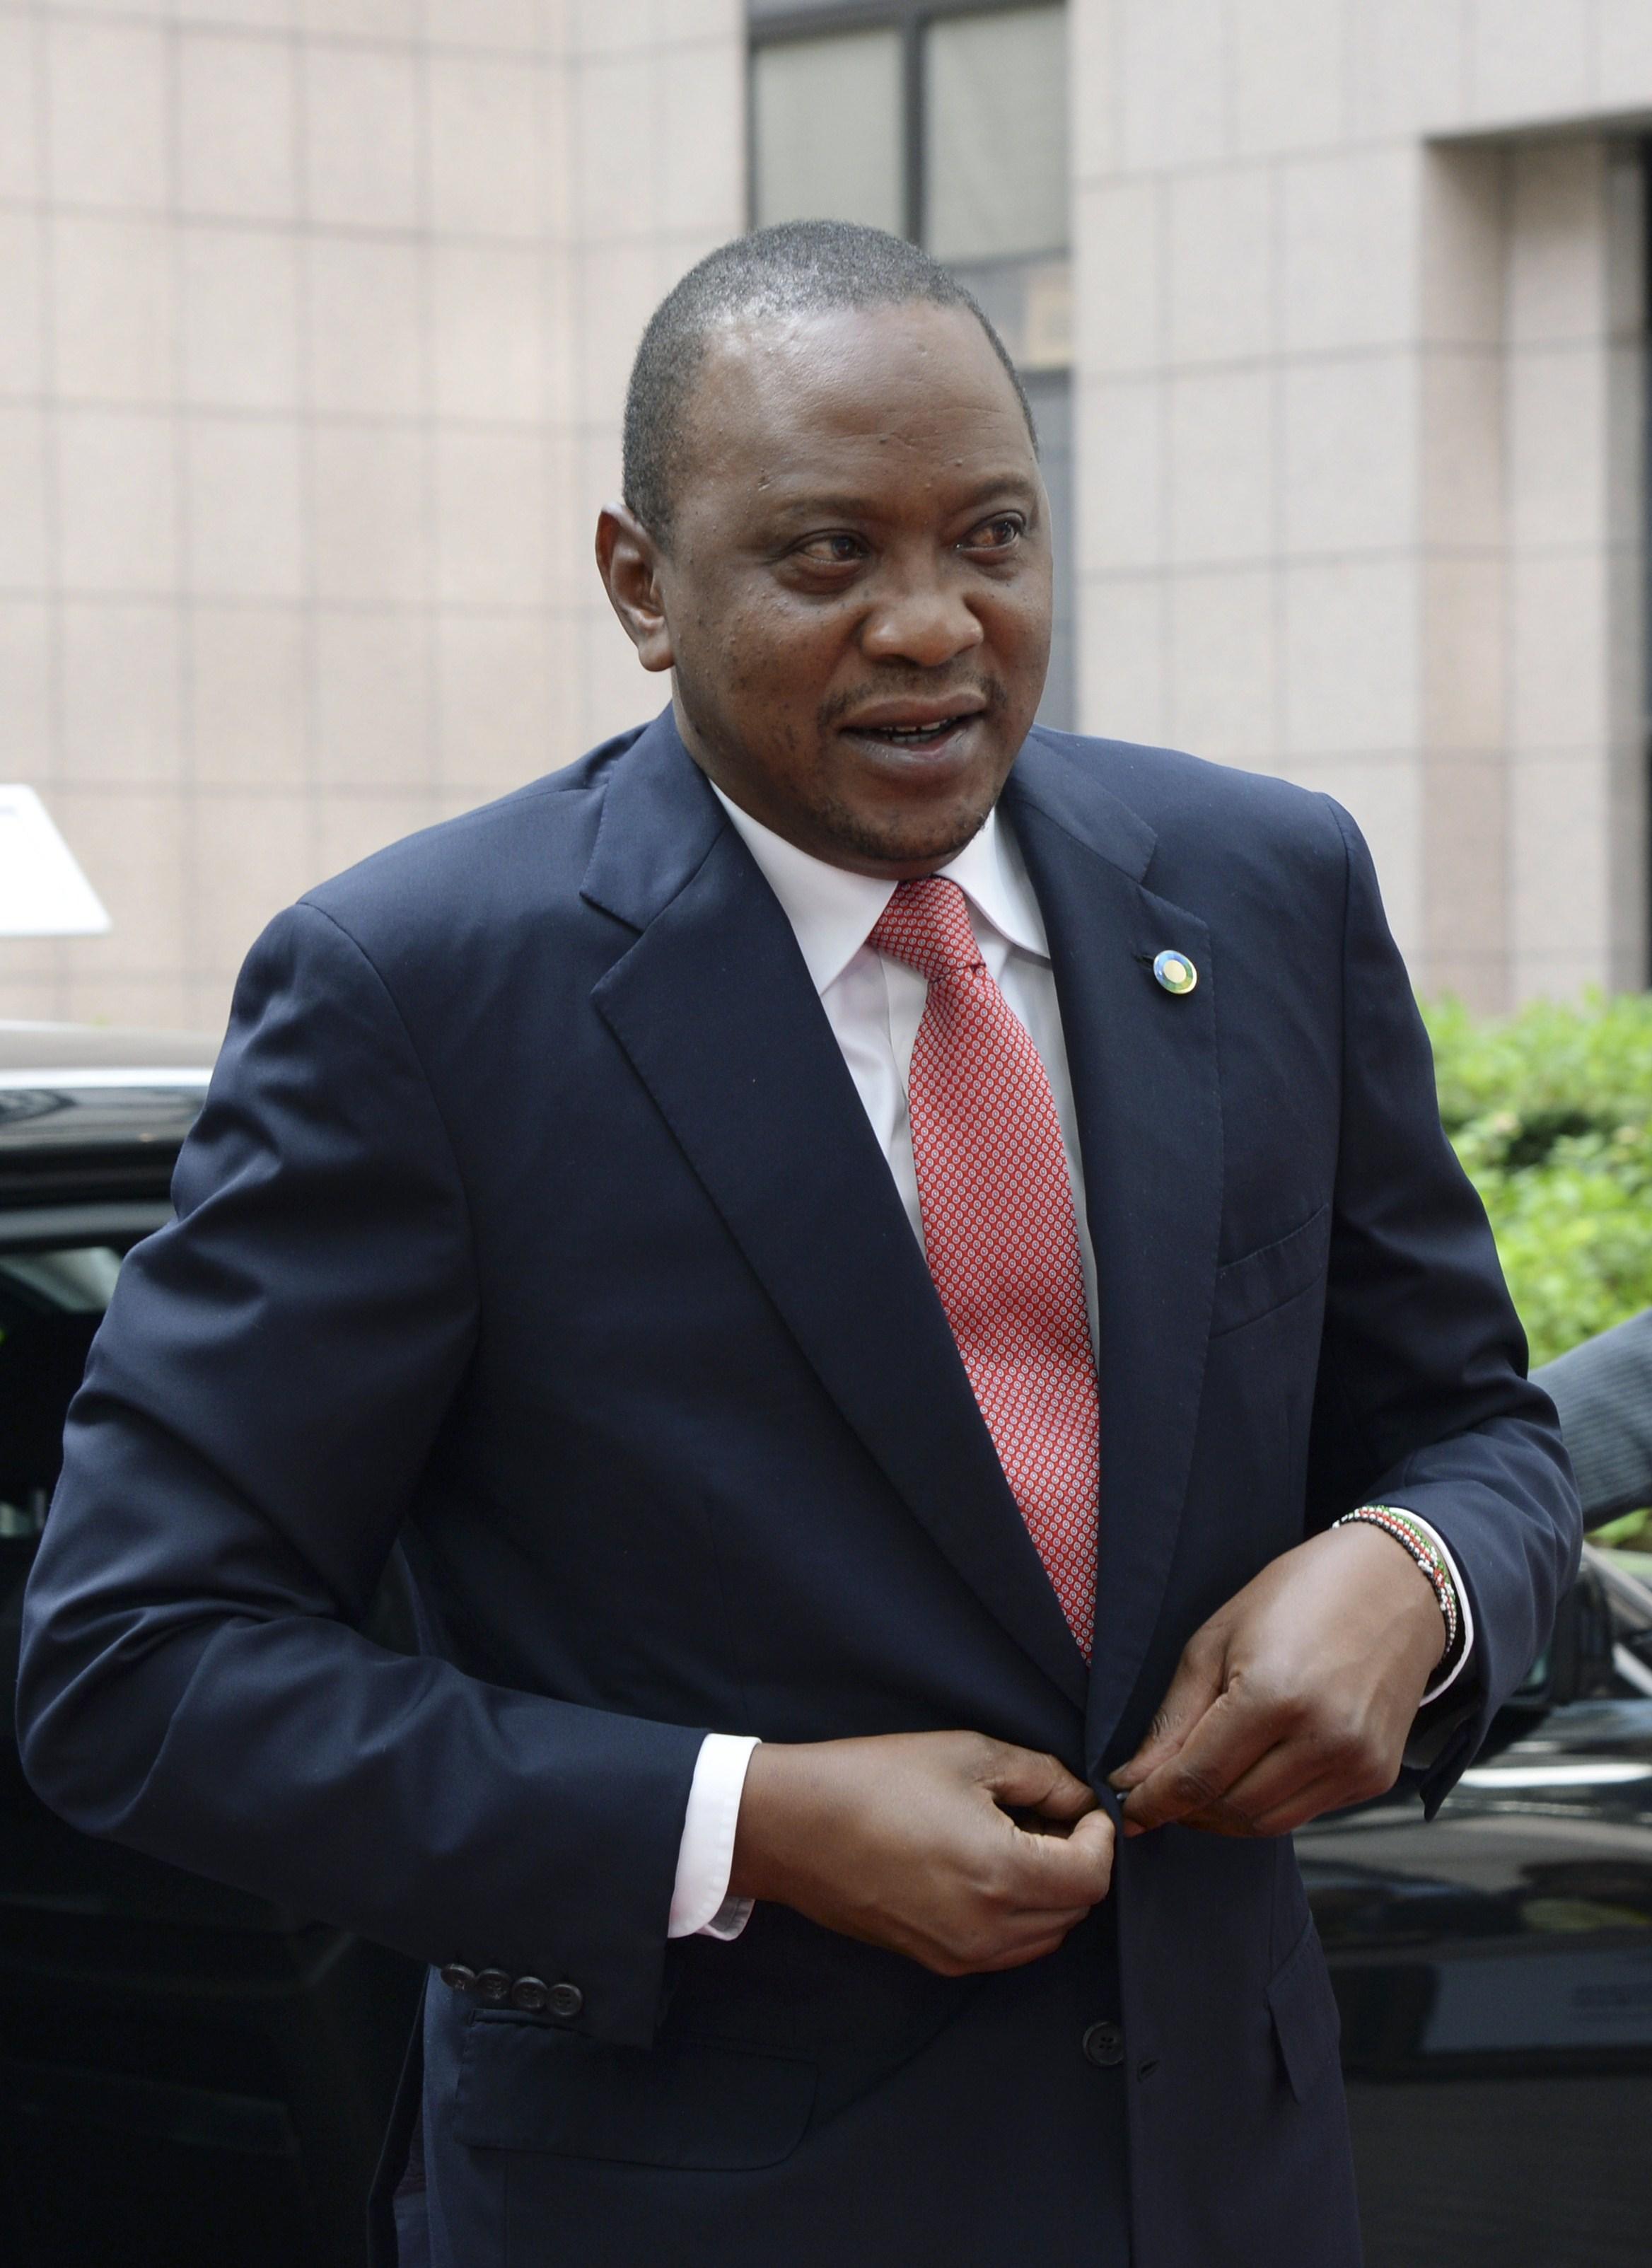 Kenya's President Uhuru Kenyatta arrives for the 4th EU-Africa summit on April 2, 2014